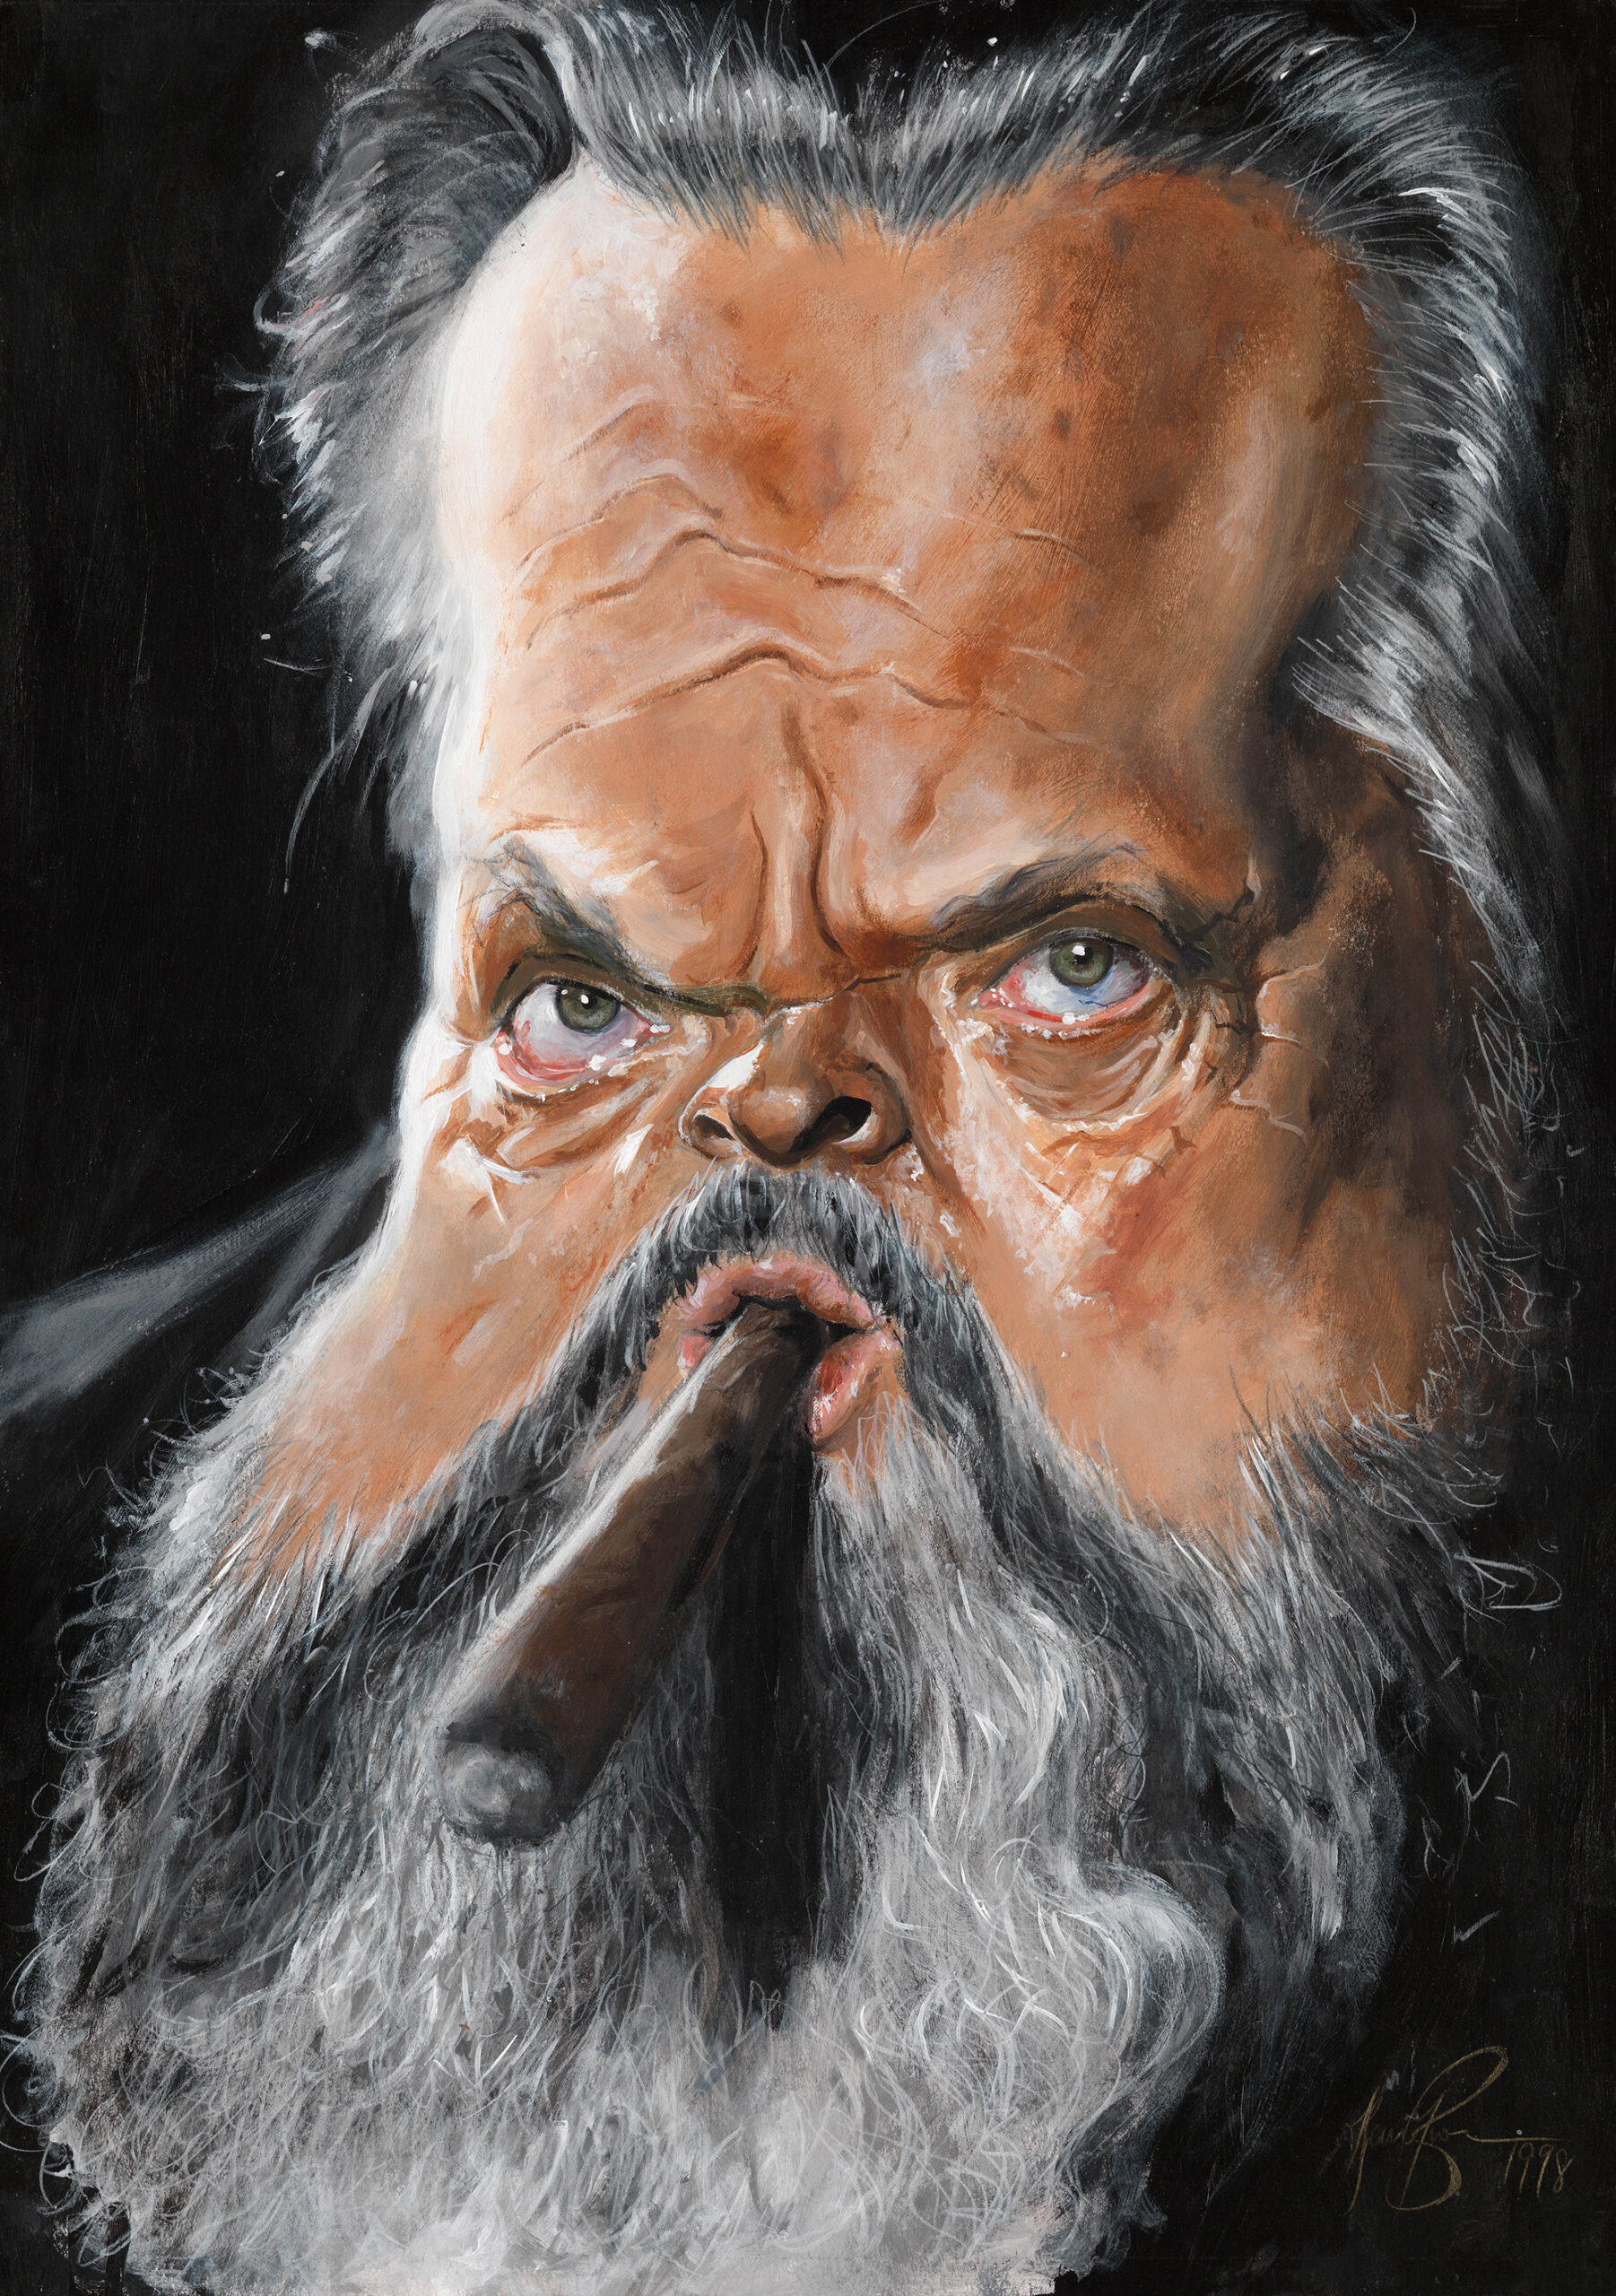 Orson Wells portrait by Derren Brown –as seen in 'Mind Control'